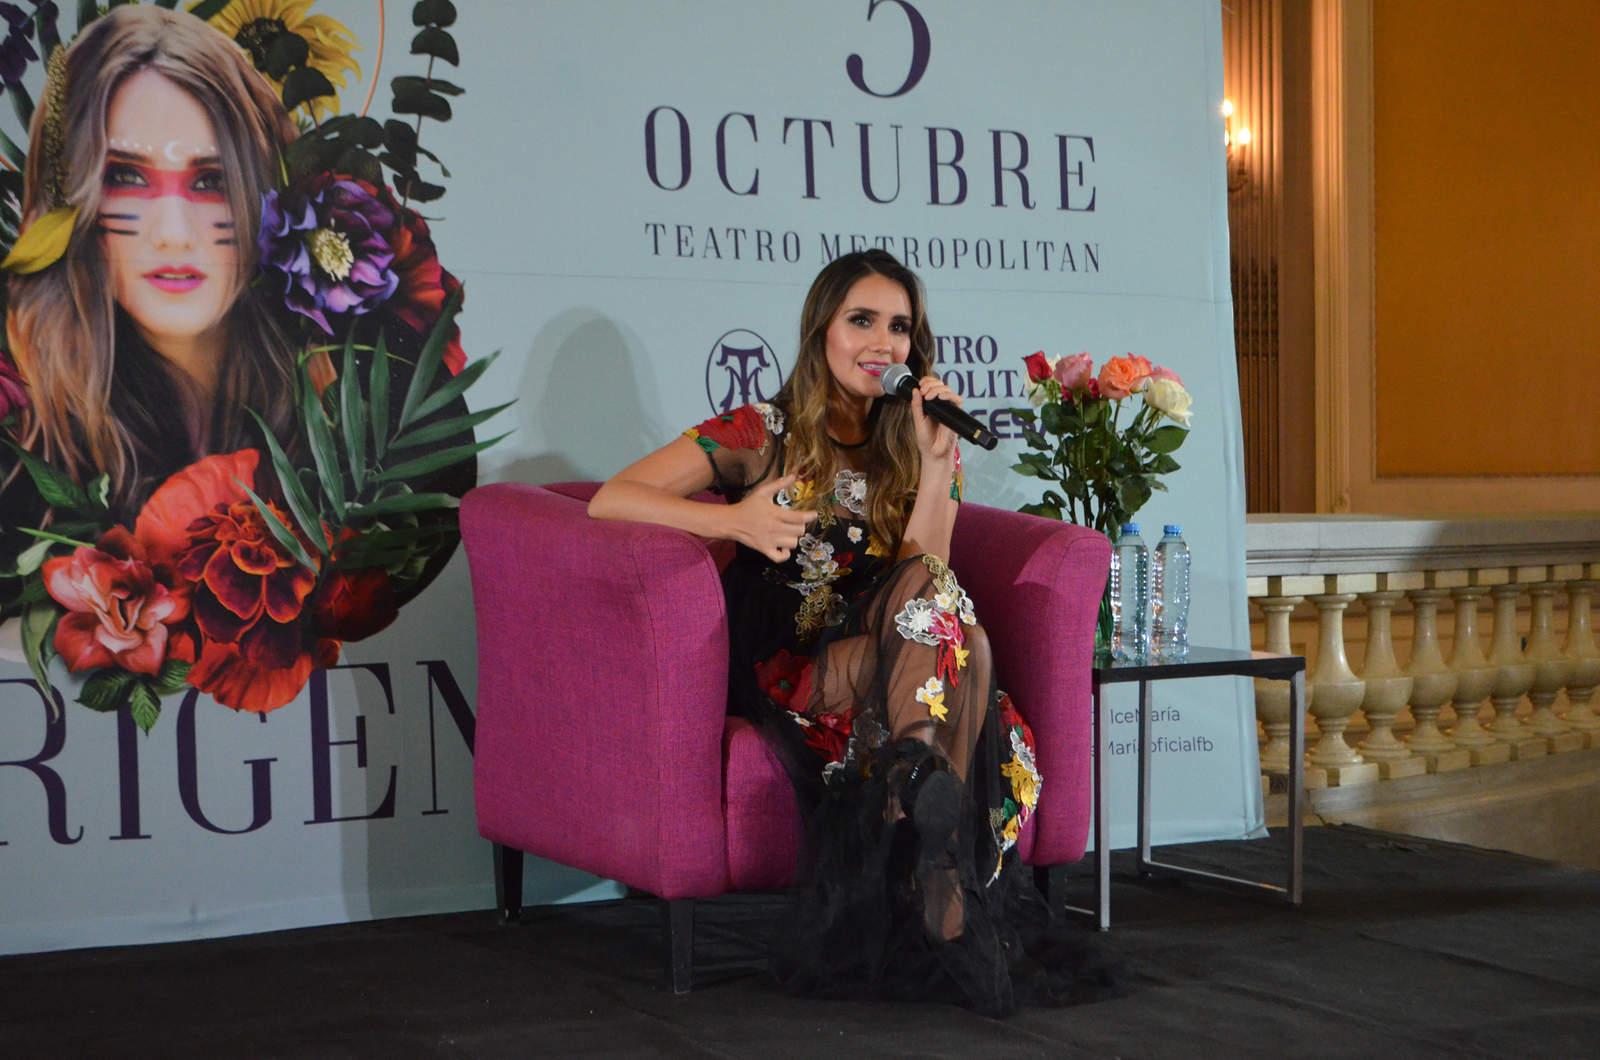 1985: Nace Dulce María, famosa cantante y actriz mexicana